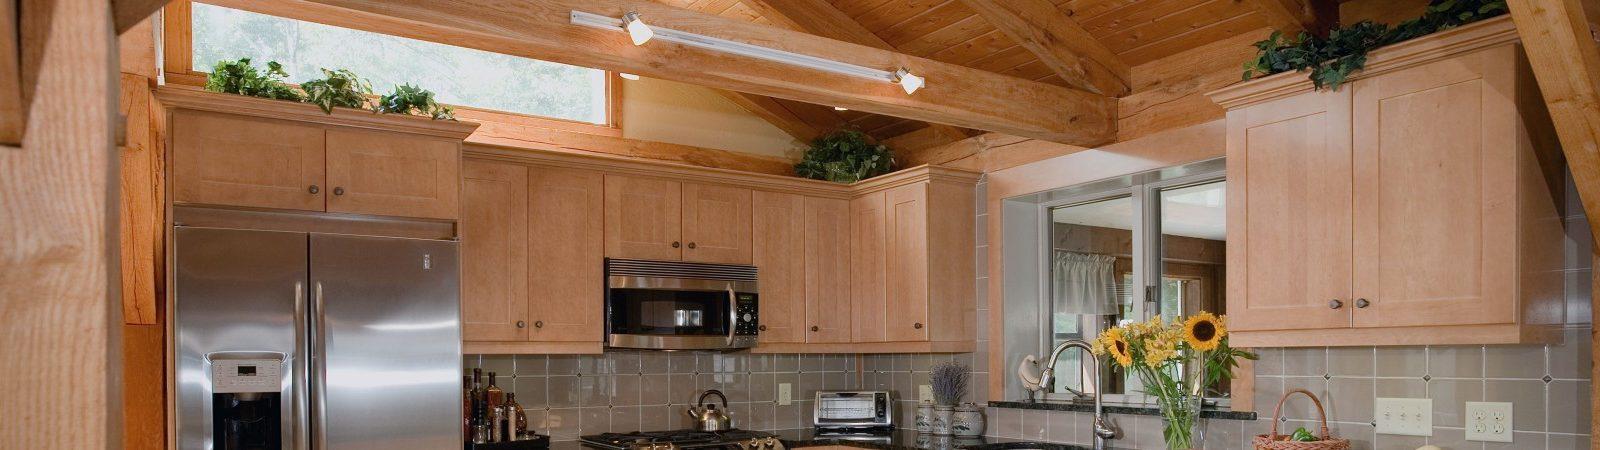 country modern kitchen cabinet ideas